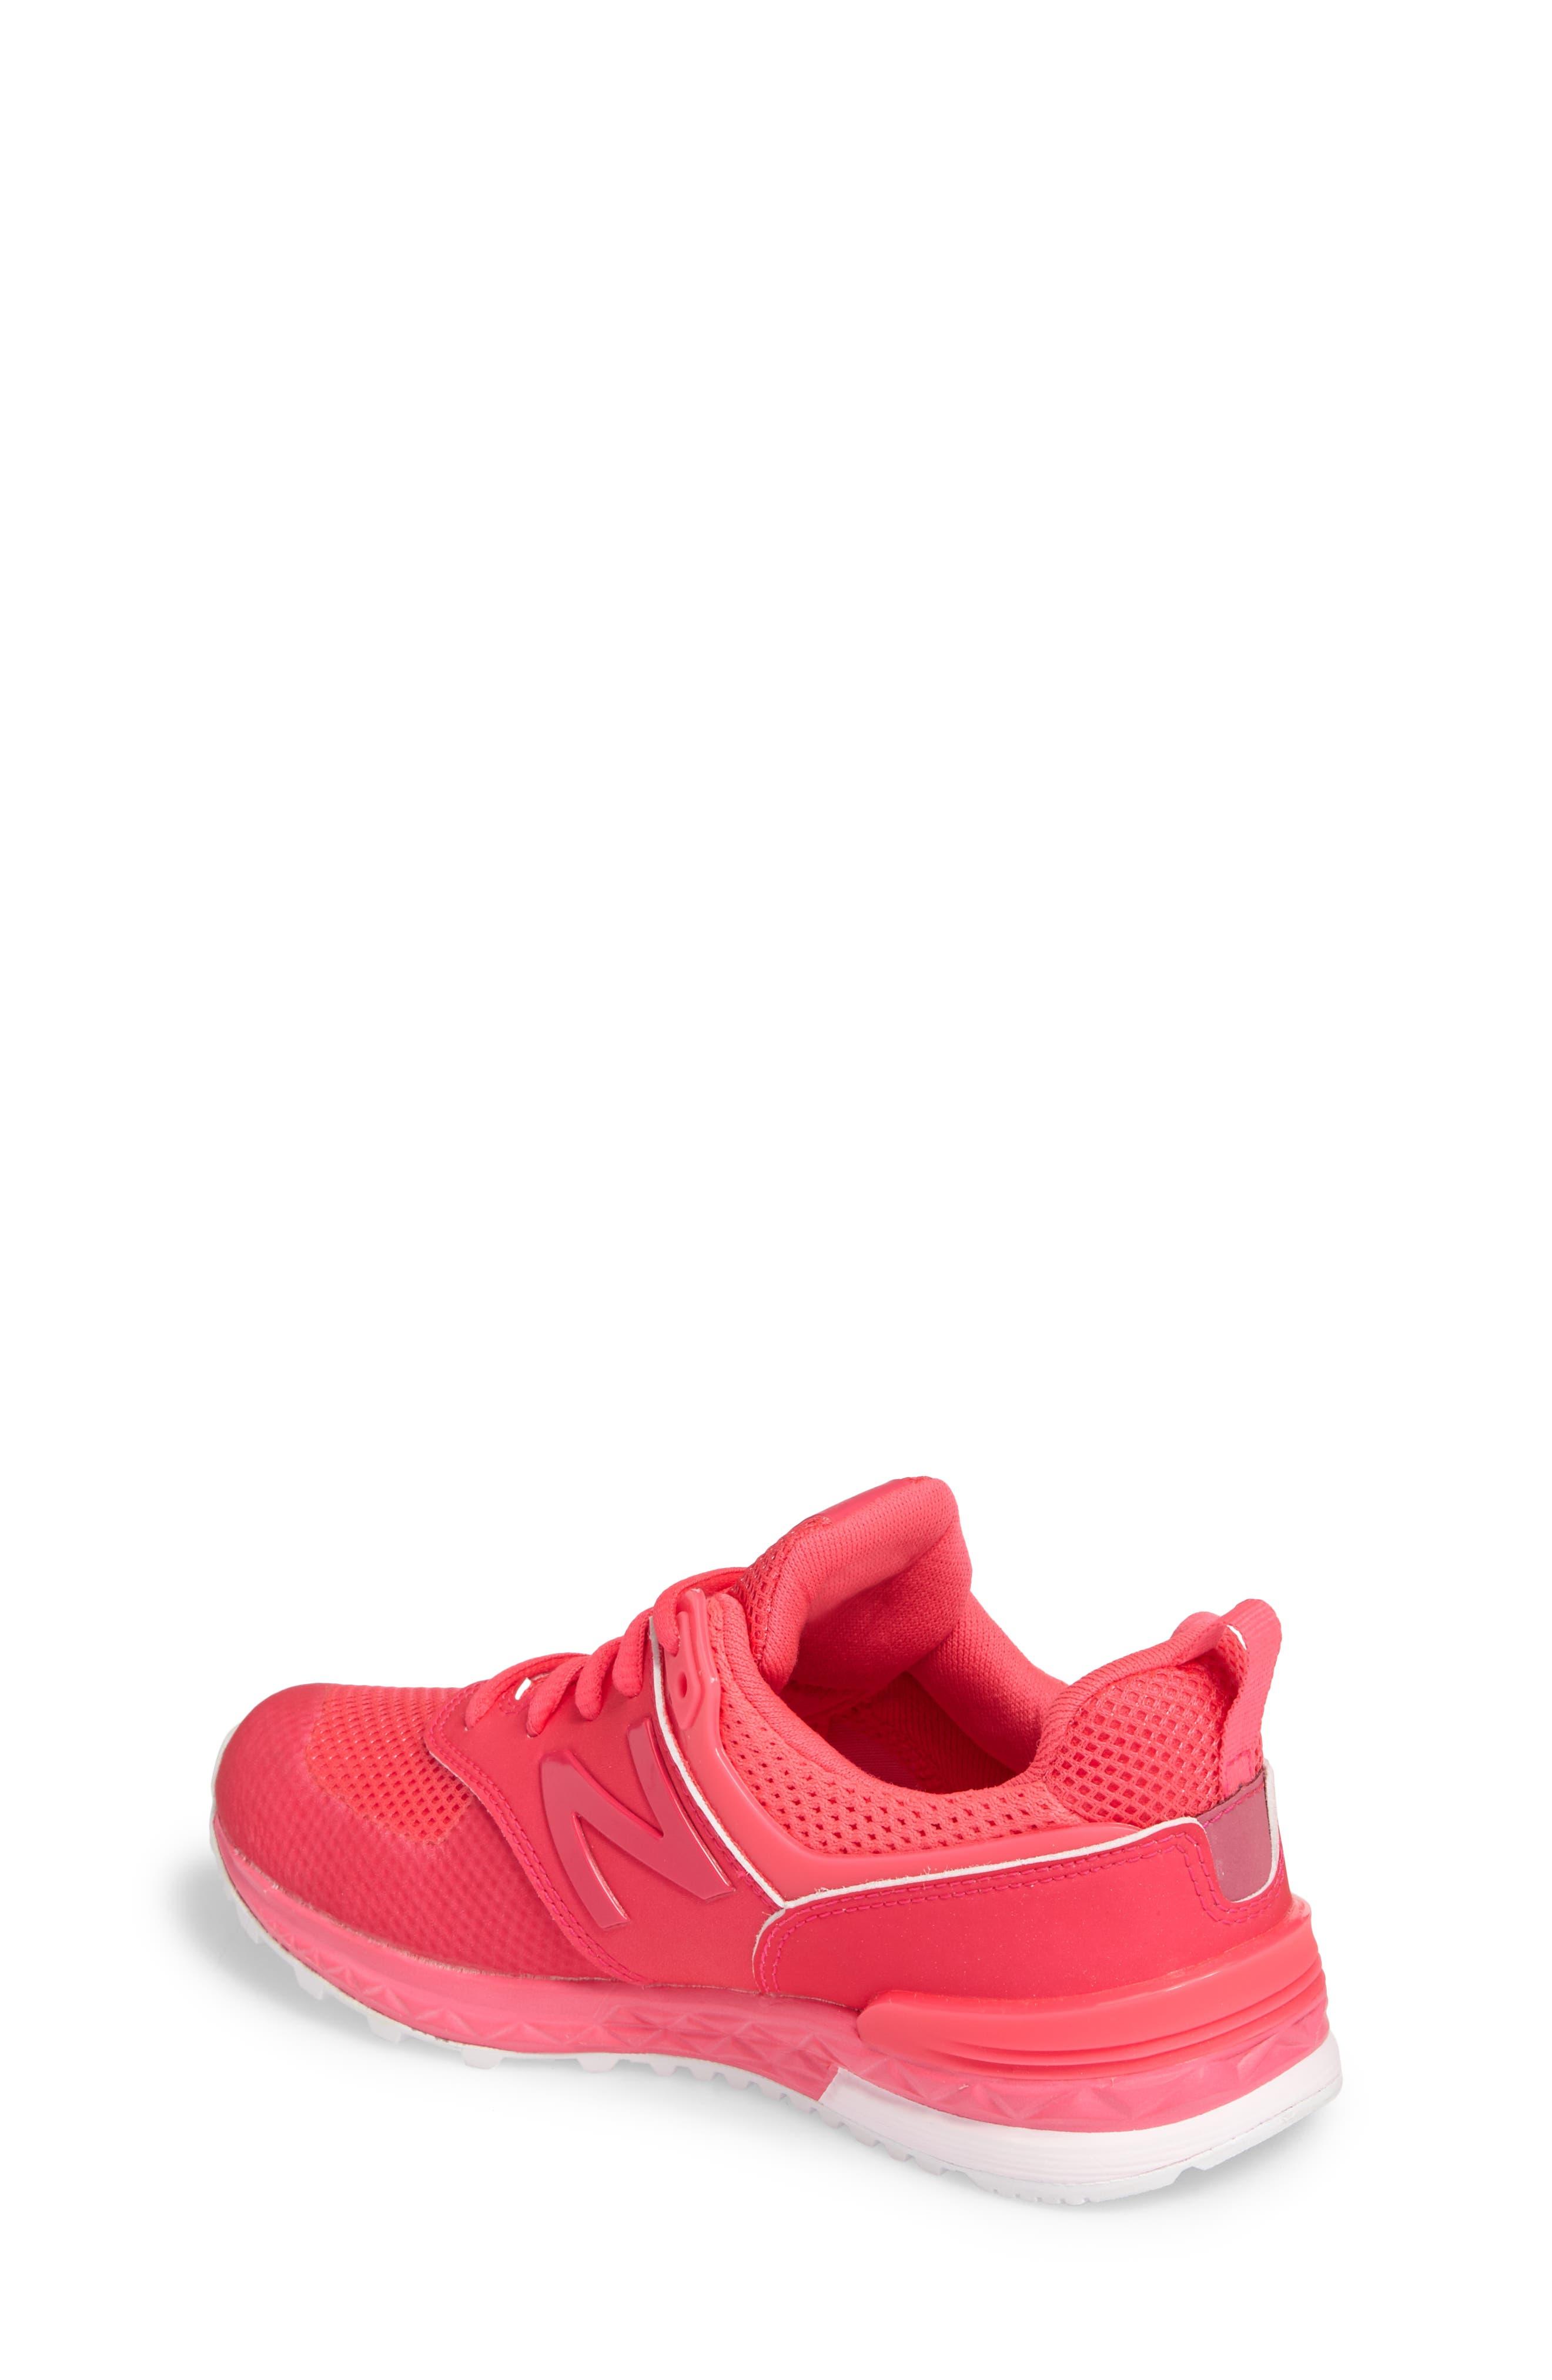 Alternate Image 2  - New Balance 574 v2 Sport Sneaker (Baby, Walker, Toddler, Little Kid & Big Kid)